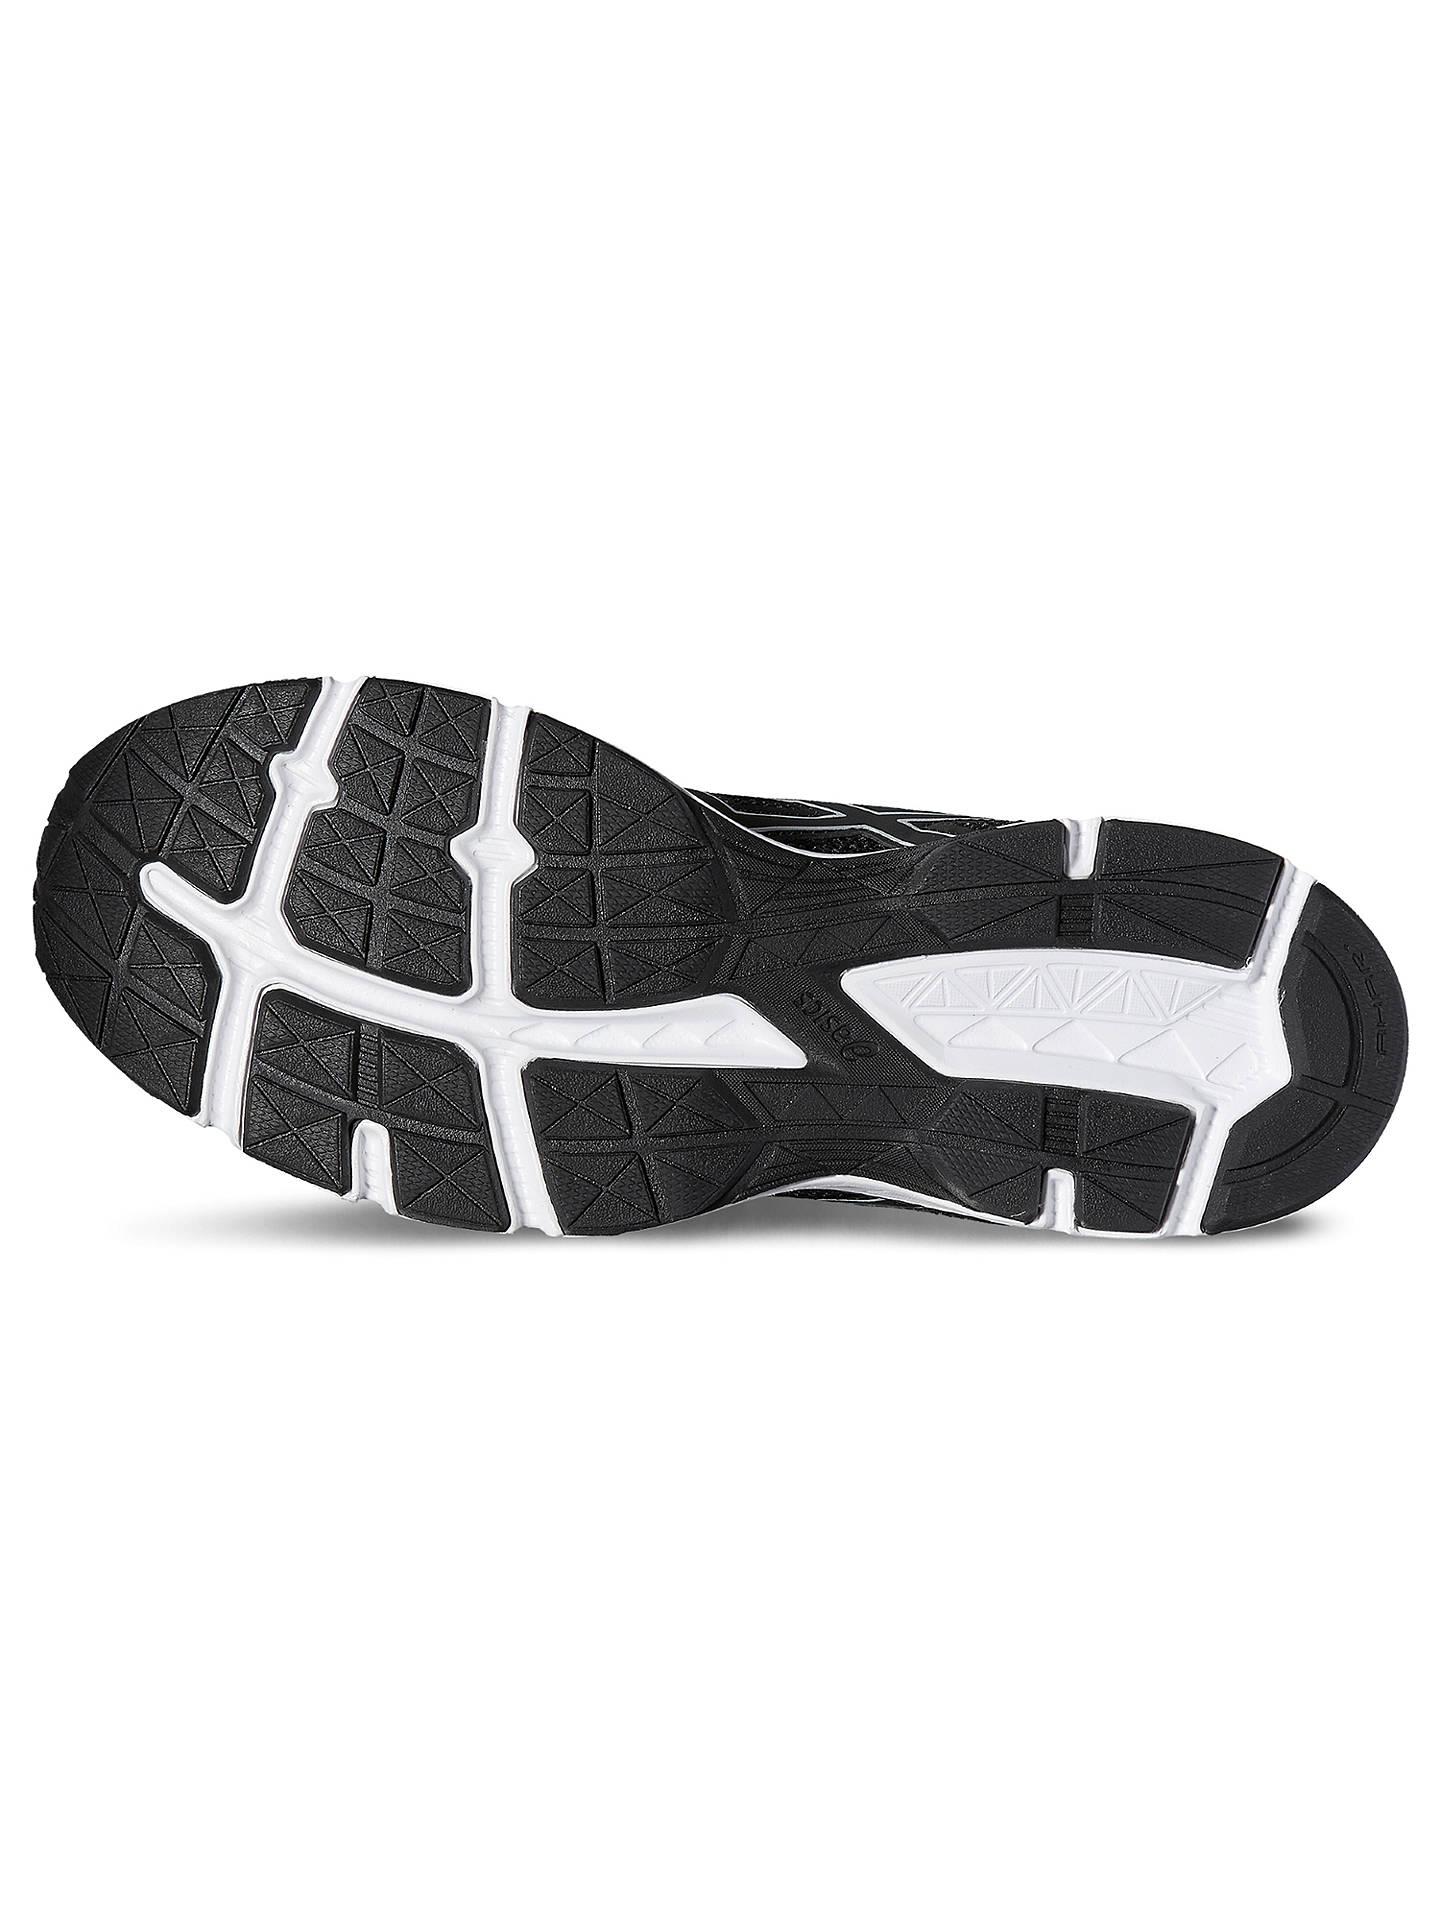 innovative design f5640 ae149 4 At Gel Asics Shoes amp Partners Lewis John Mens Running Excite Black  HTSwEqS